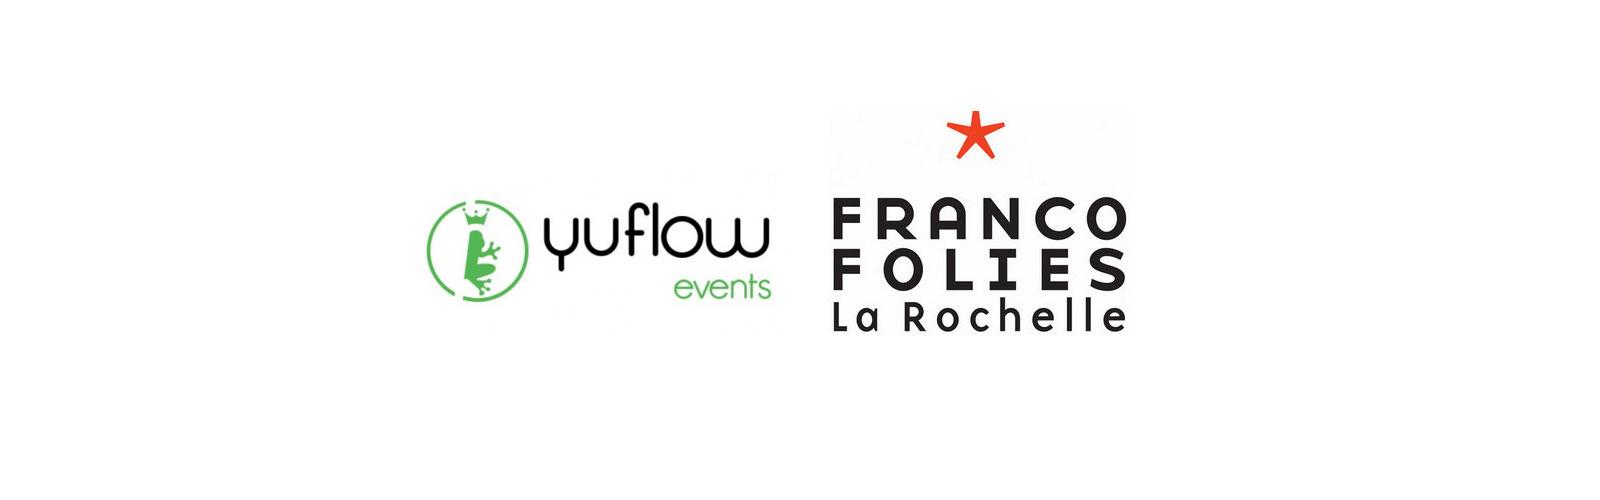 yuflow-francofolies